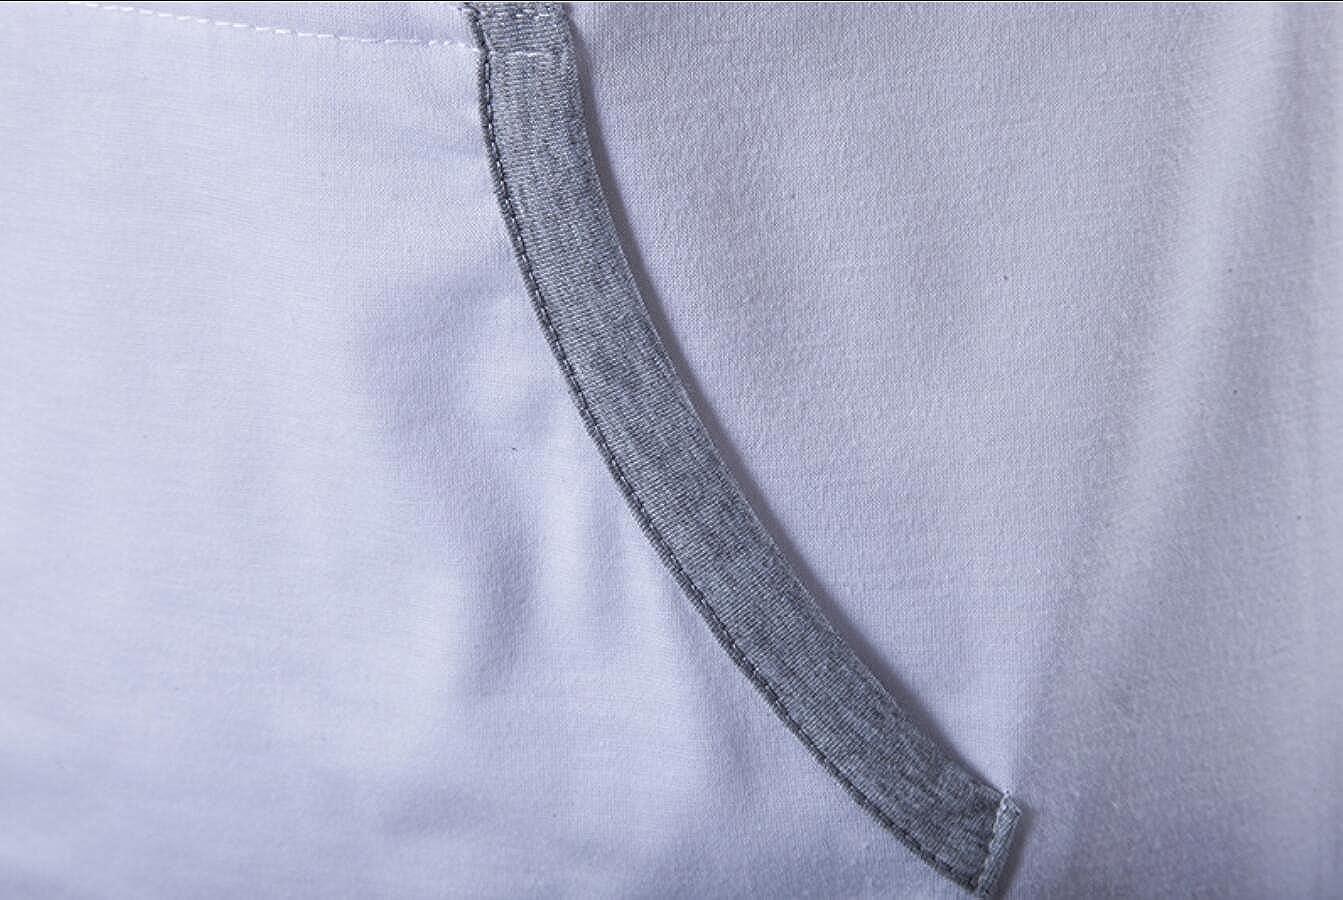 Mens Hoodie Sleeveless Pocket Splice Pullover Shirt Top Vests